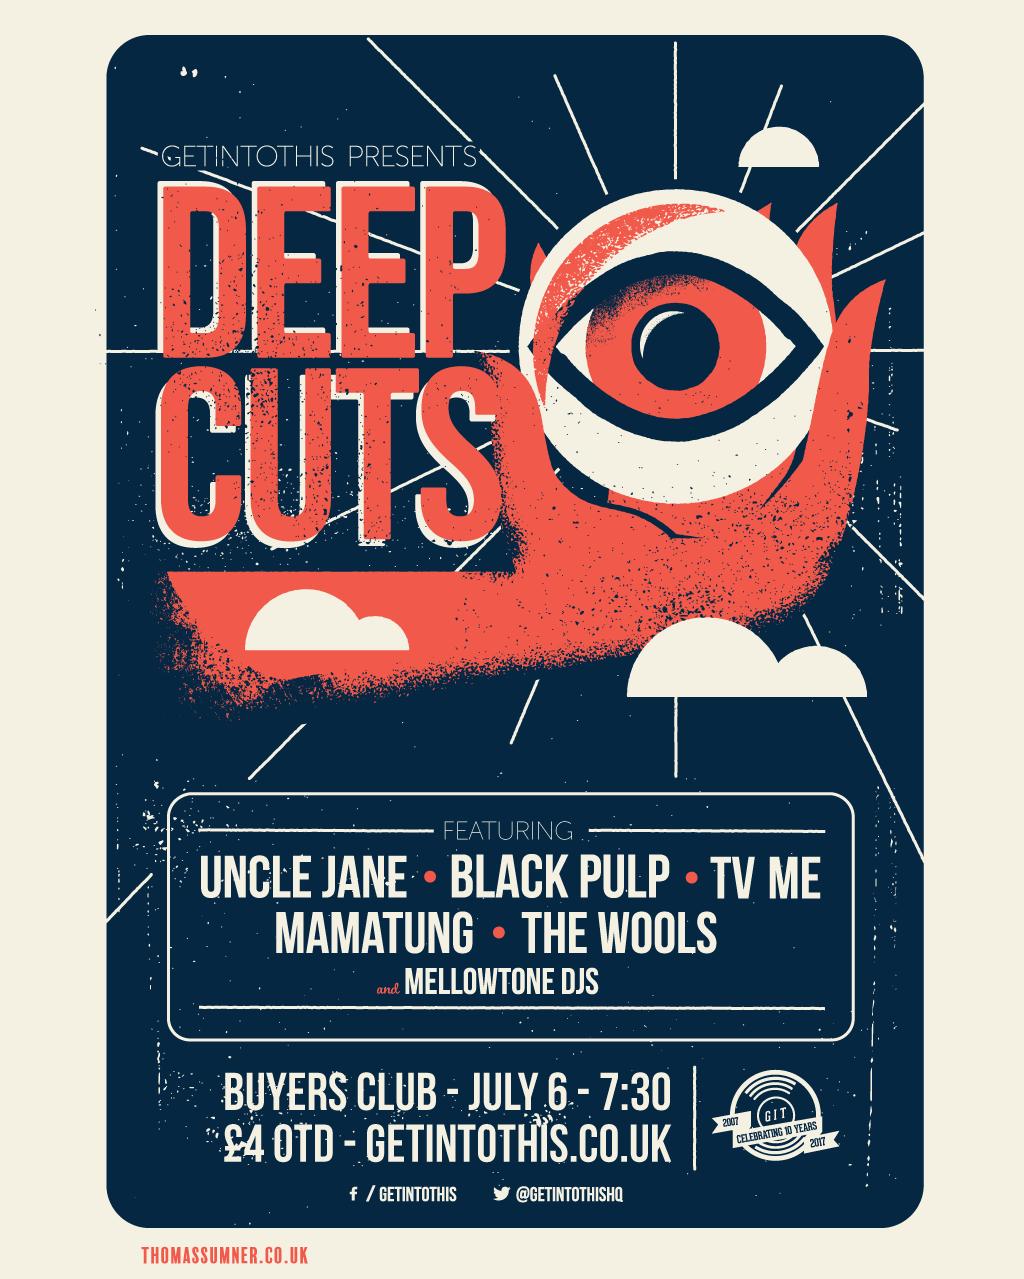 Getintothis presents Deep Cuts live - July 2017